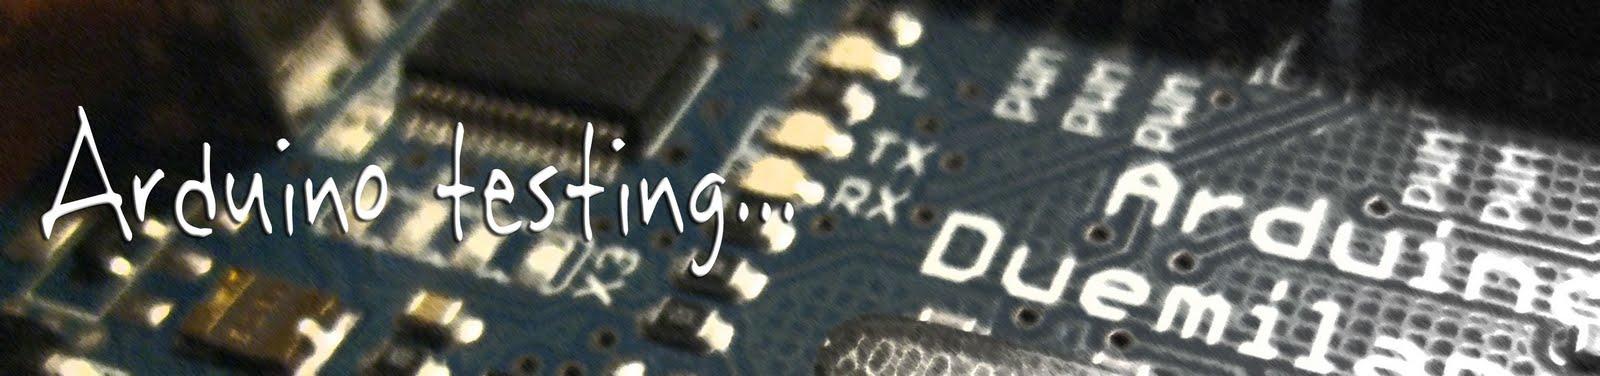 Arduino Testing...